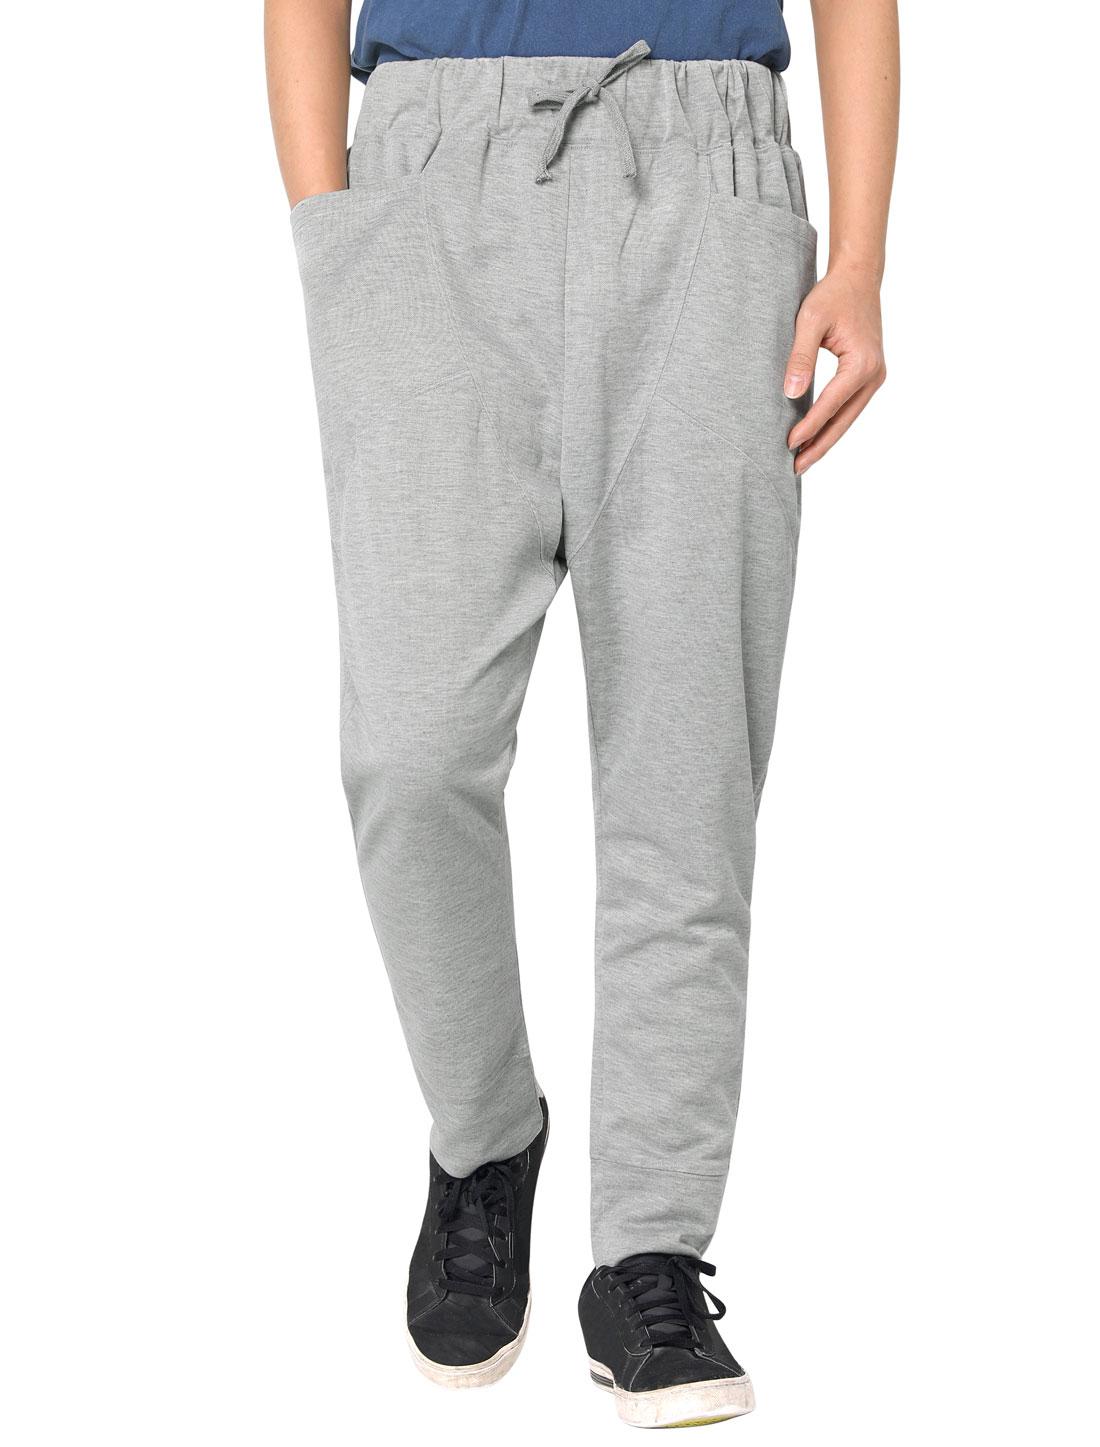 Men Stretchy Waist Design Sports Wear Light Gray Casual Pants W28/30